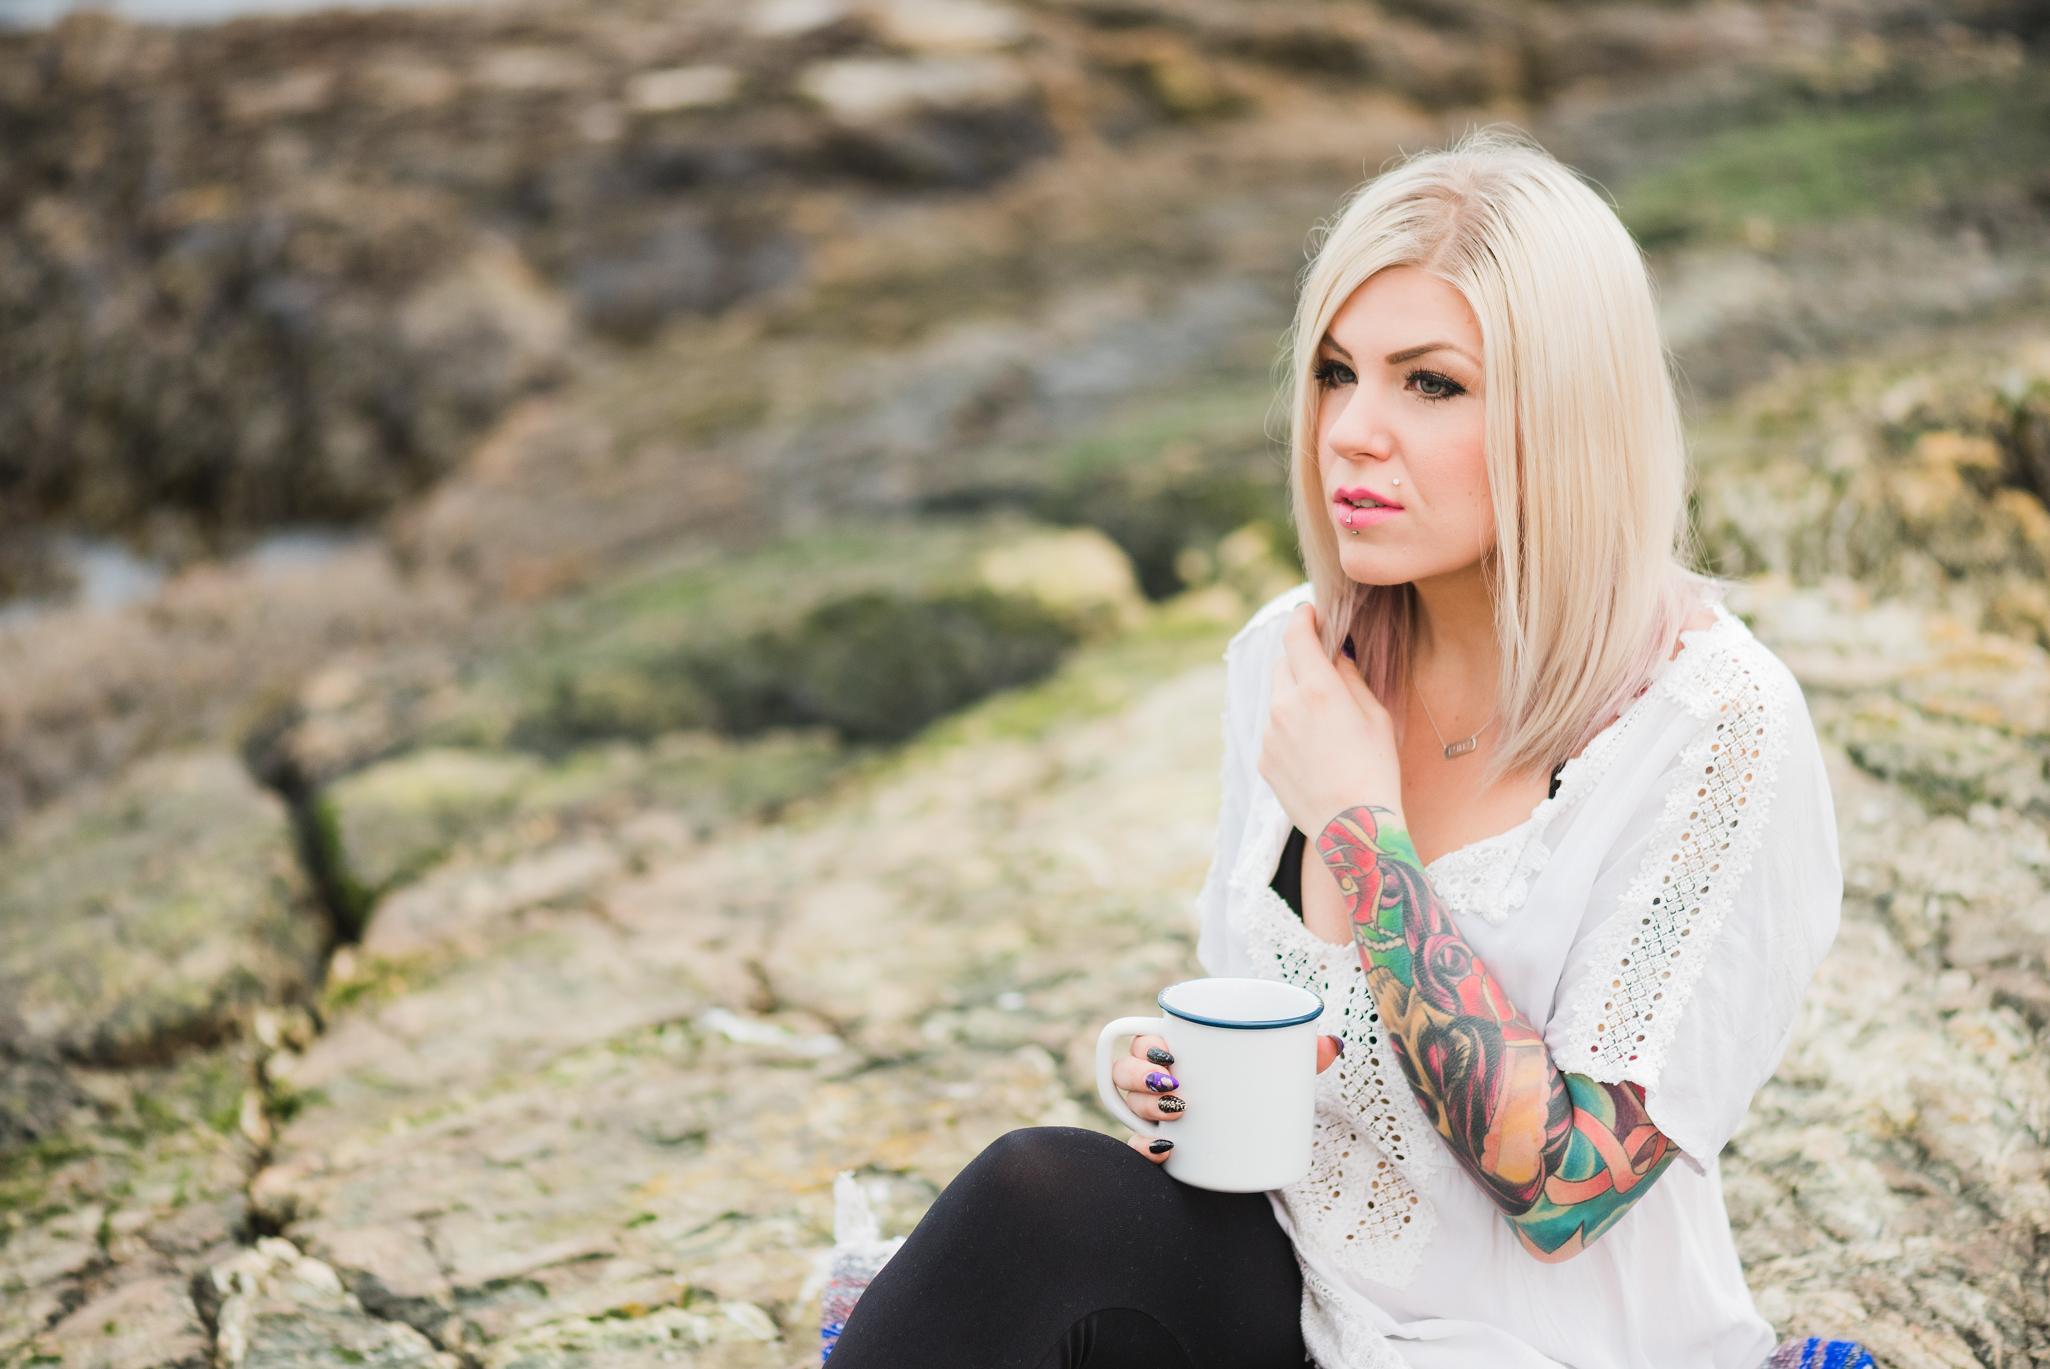 Nicola_Reiersen_Photography_Victoria_BC_Photographer (33).jpg